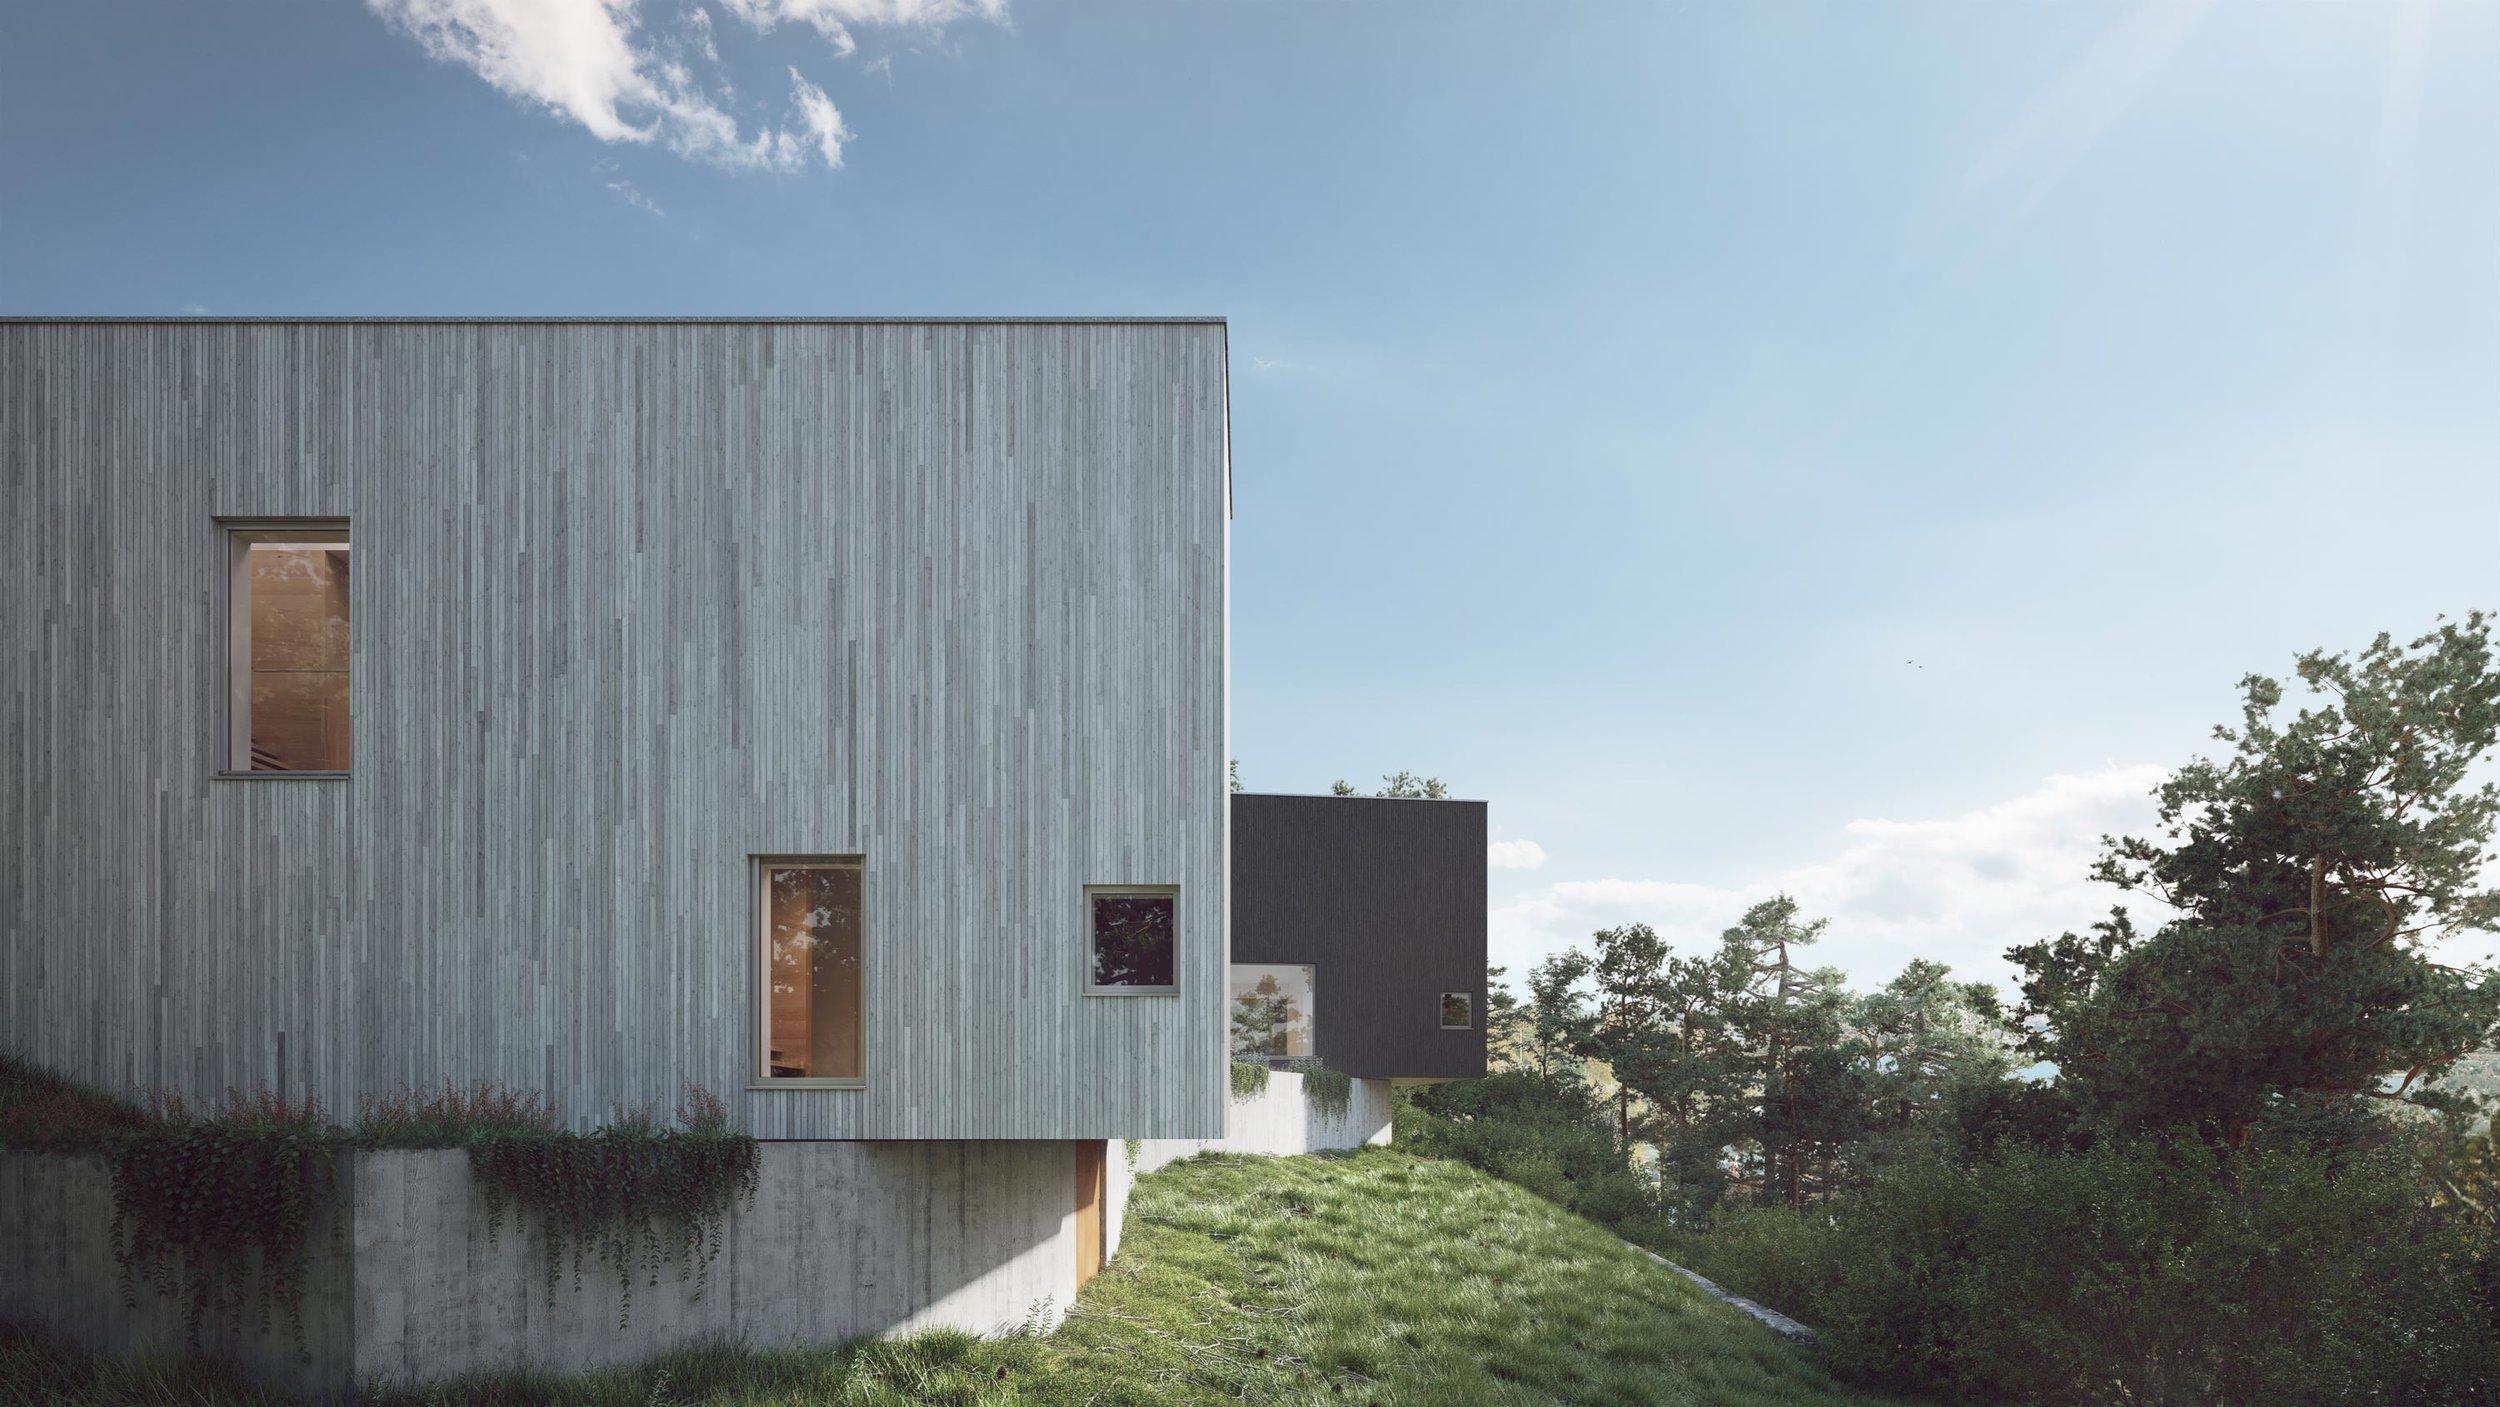 pyrus luxury villas, strom architects, imola, 4.jpg